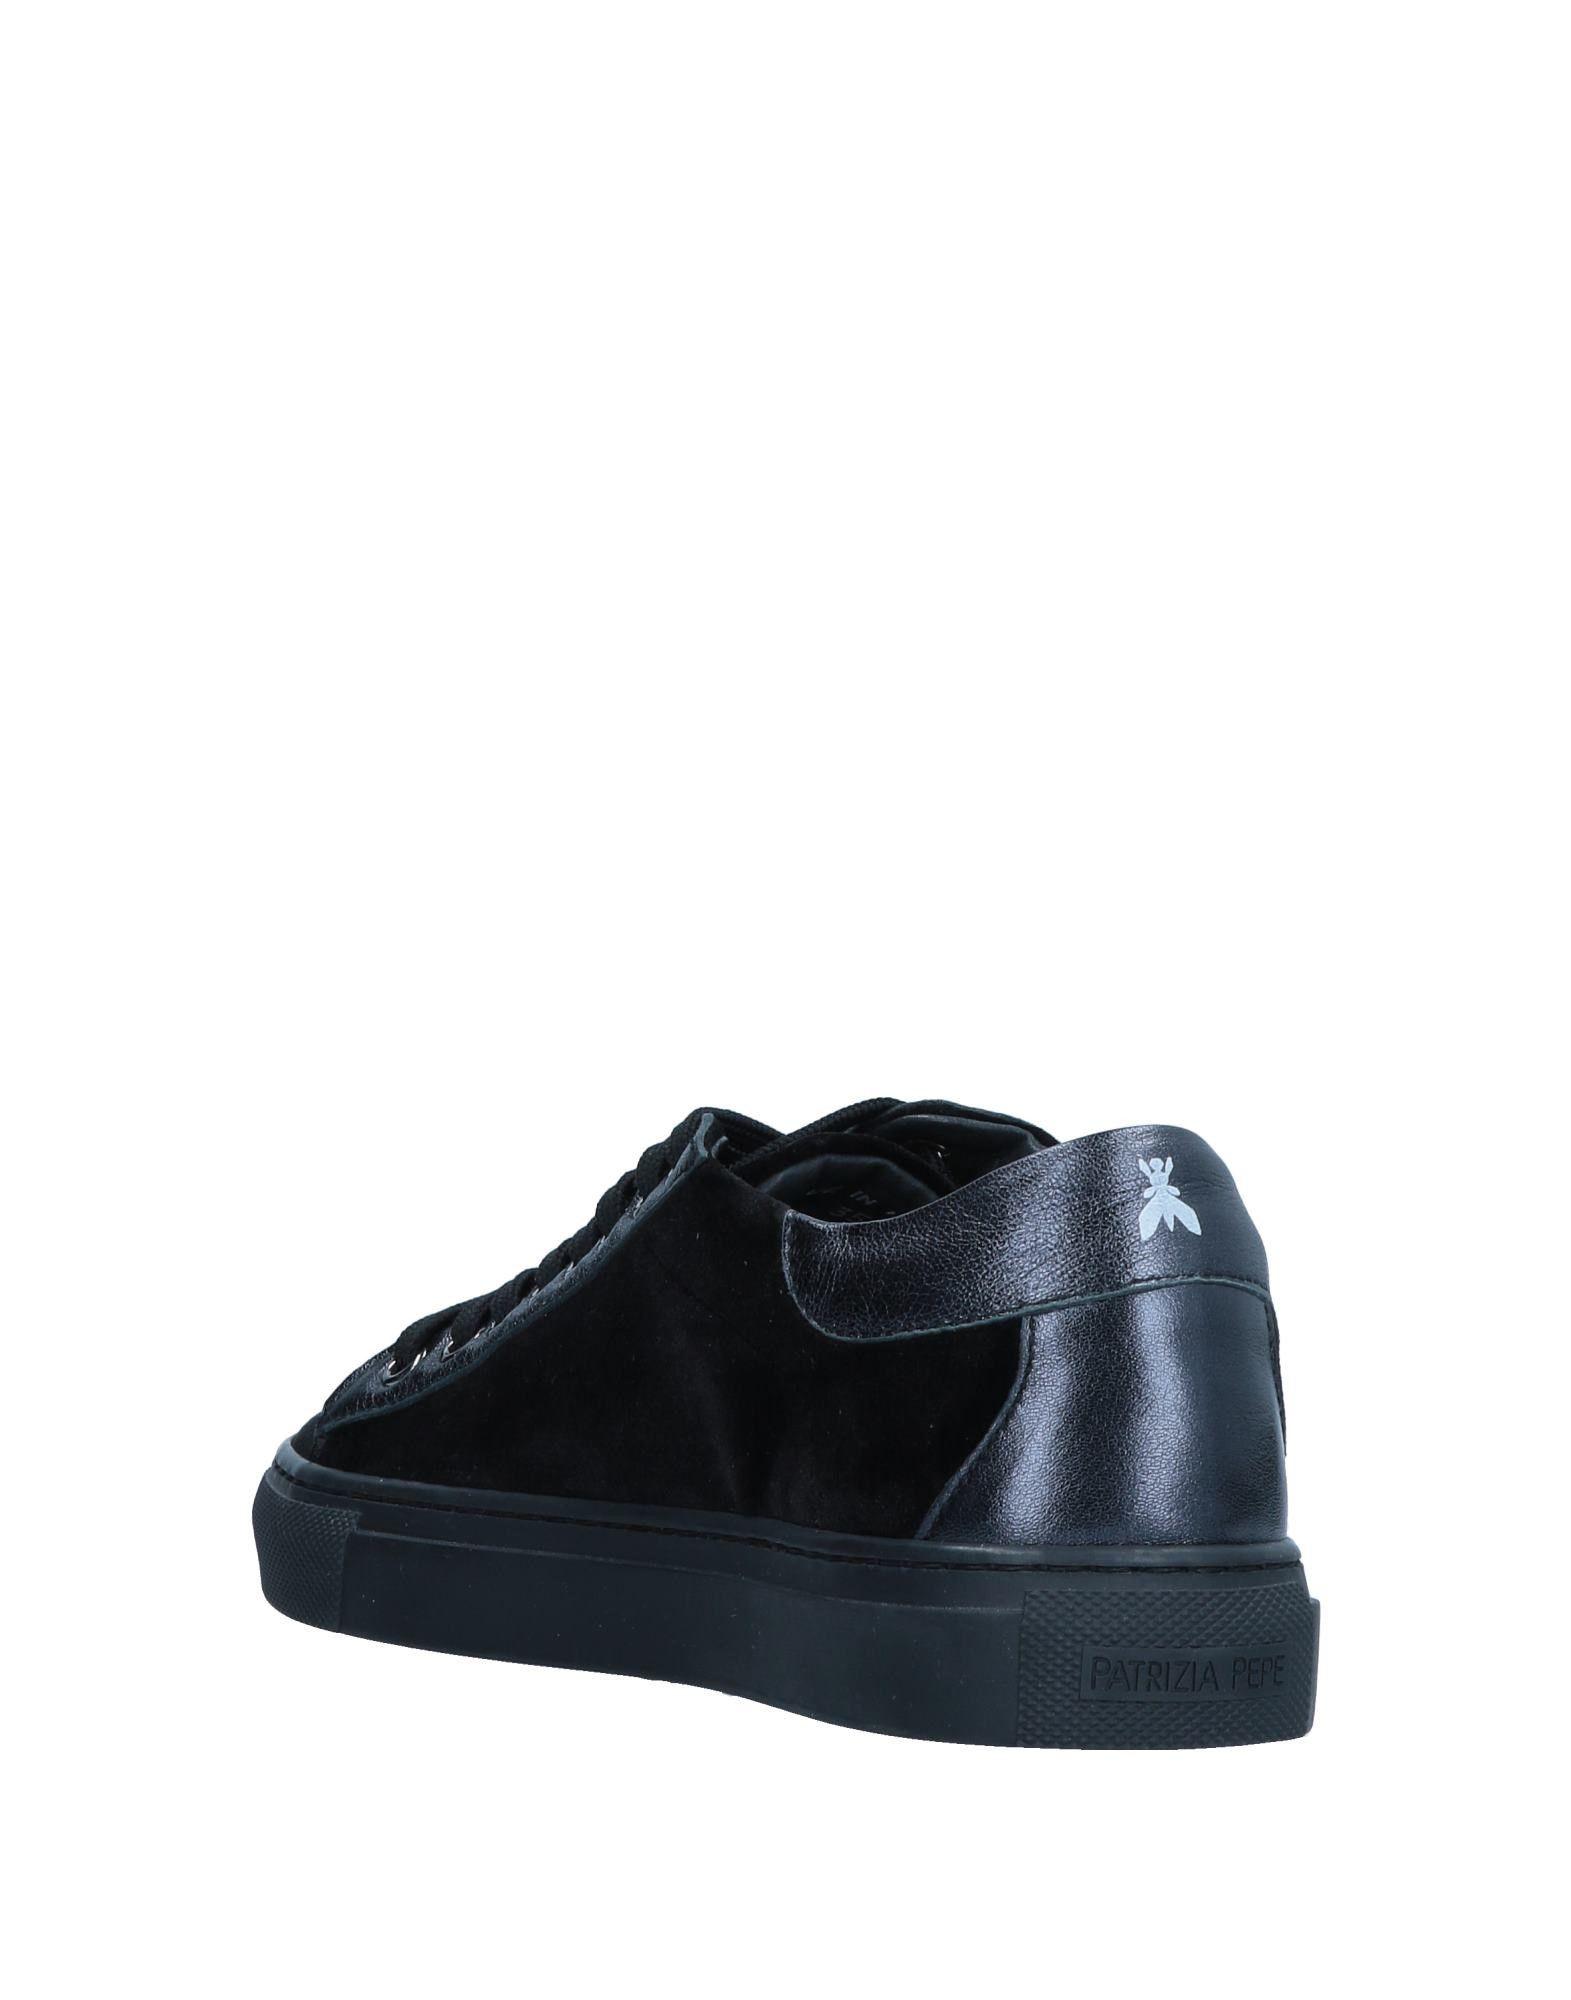 Gut tragenPatrizia um billige Schuhe zu tragenPatrizia Gut Pepe Sneakers Damen  11548802BL 0c080f